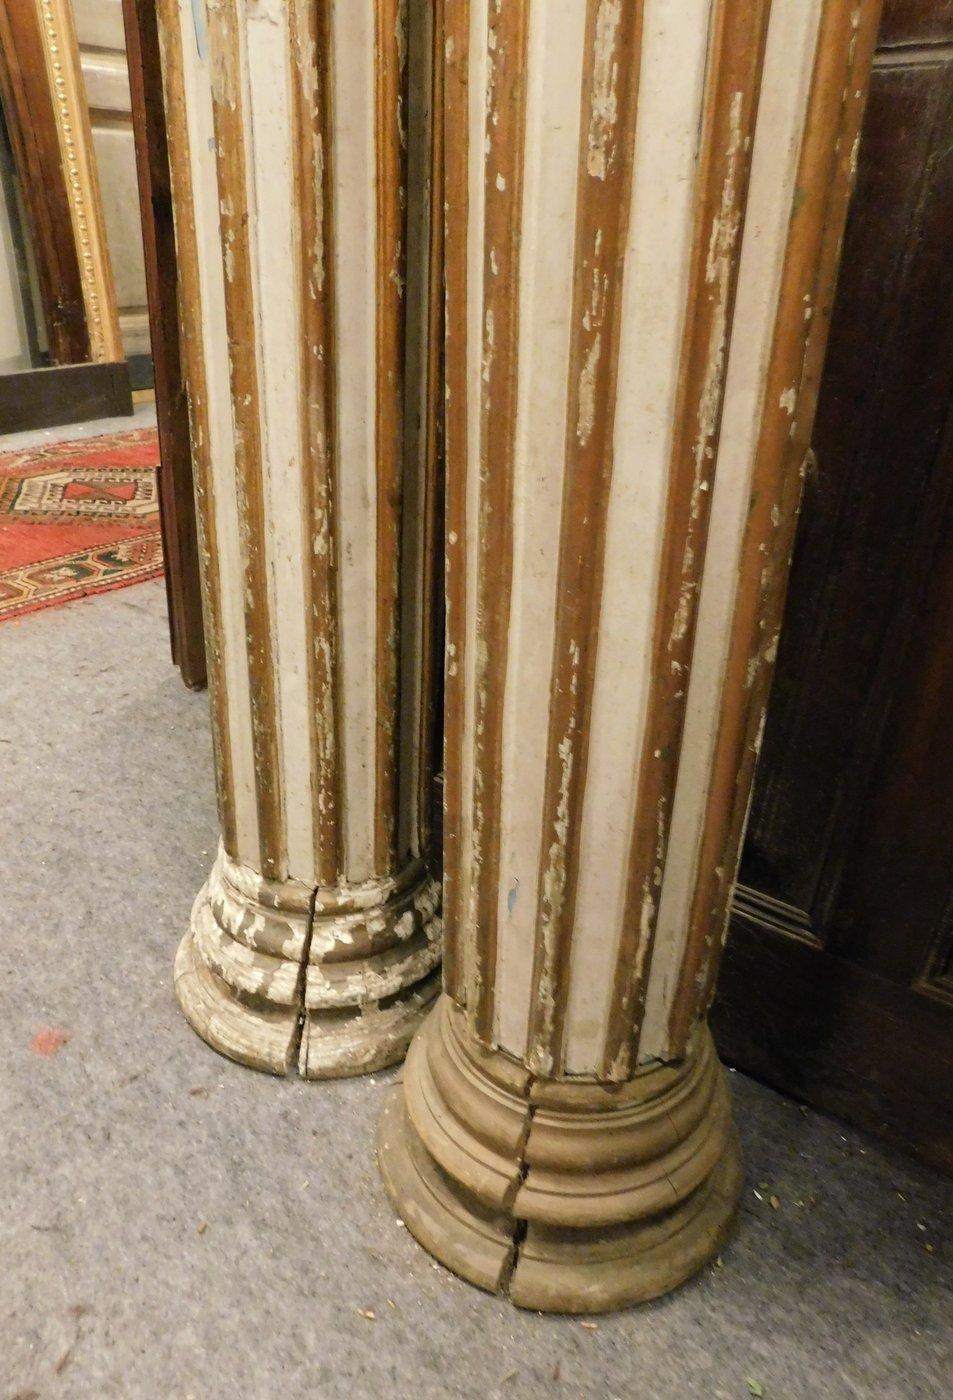 thumb4|dars344 - n. 2 colonne in legno, mis. cm 25 x cm 196 h